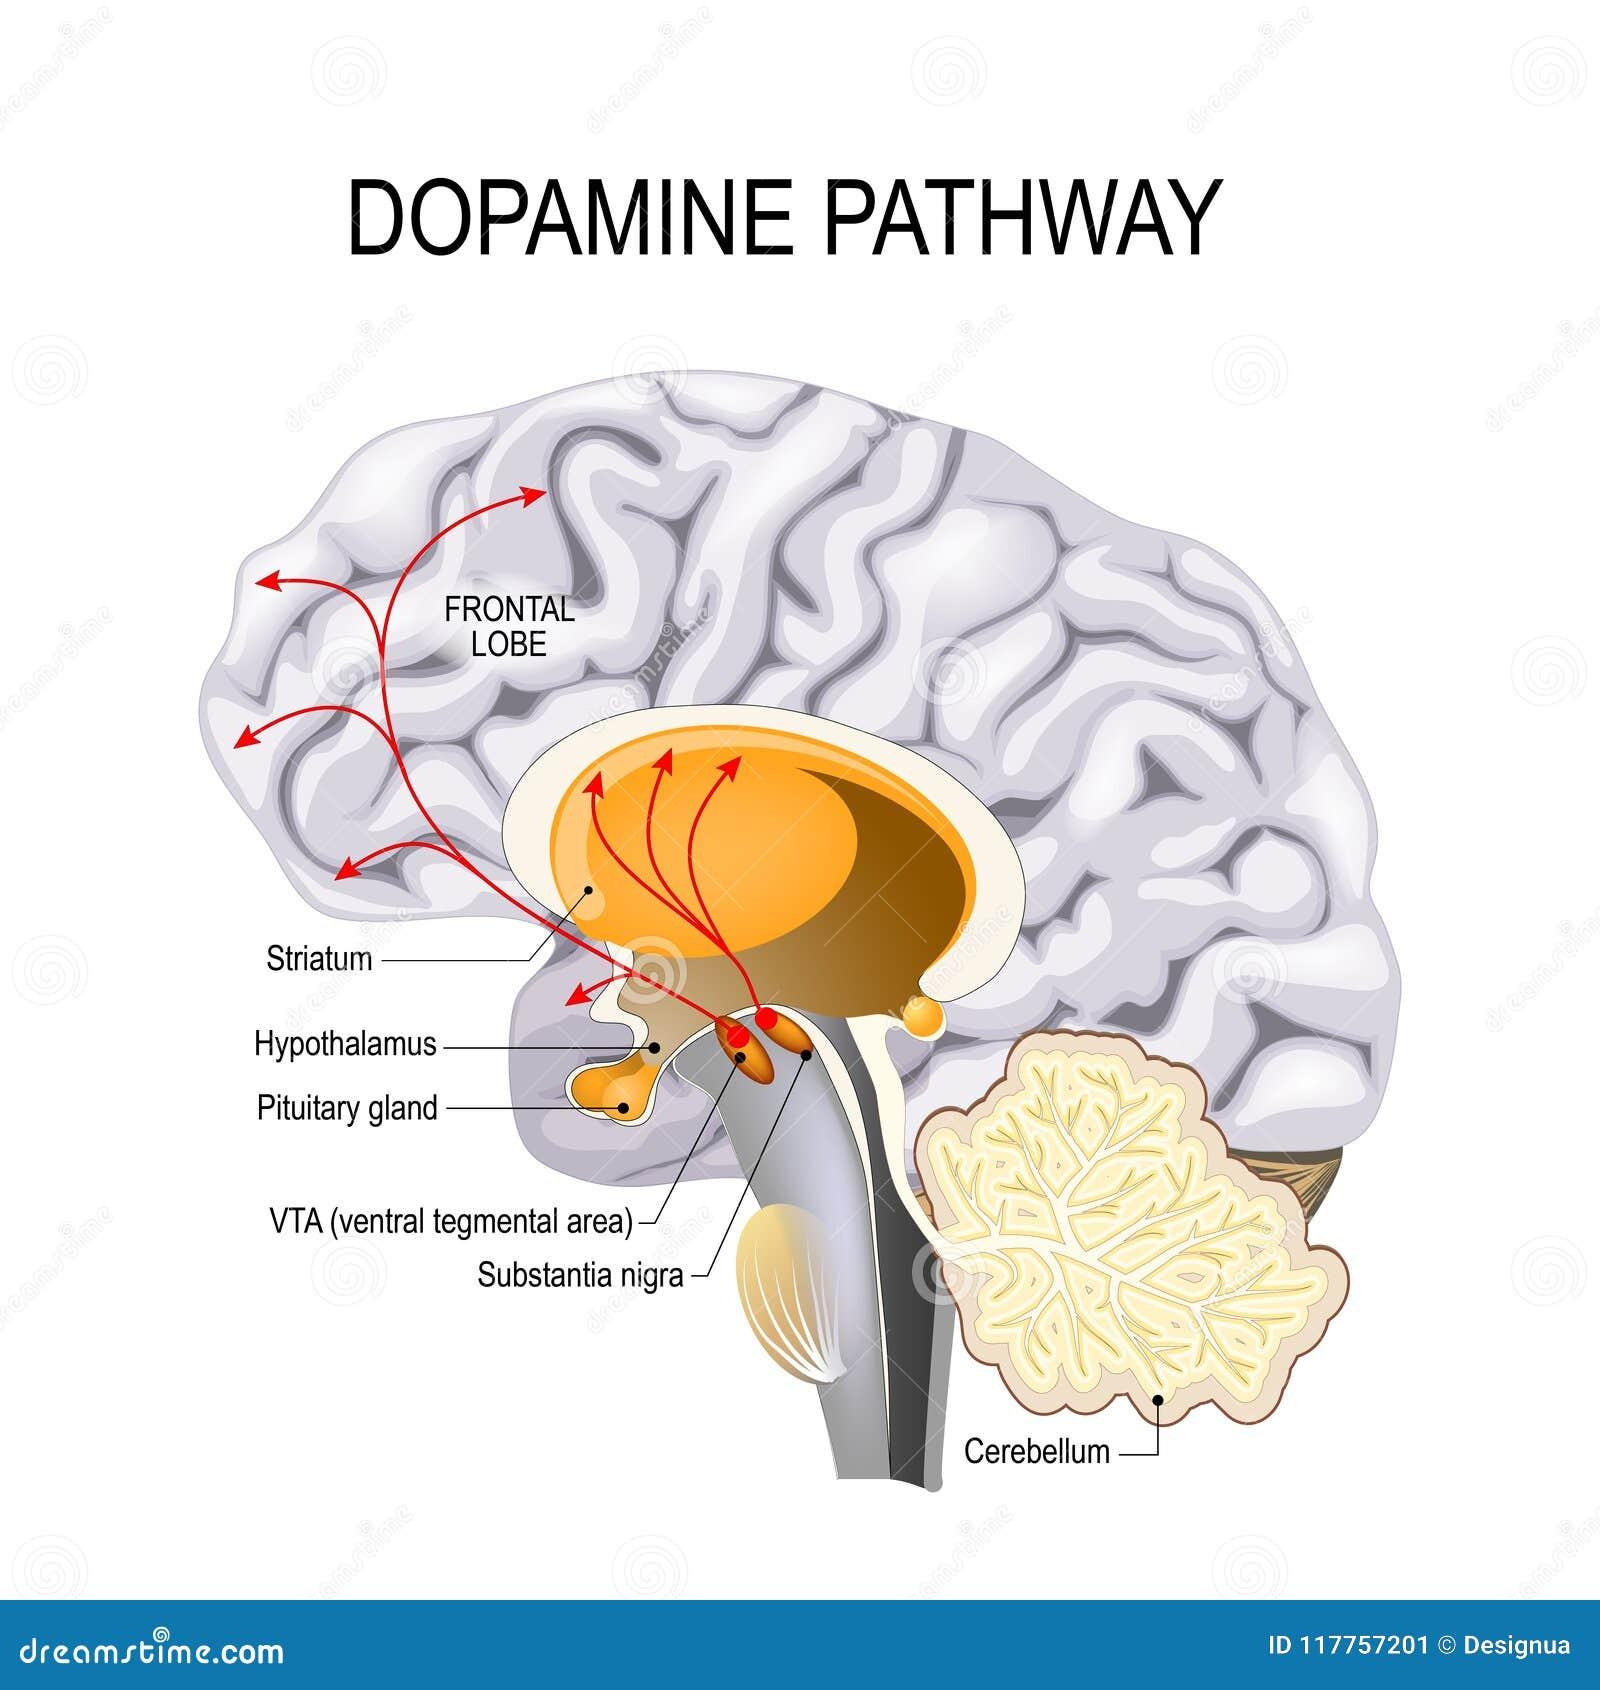 Dopamine hypothesis of schizophrenia